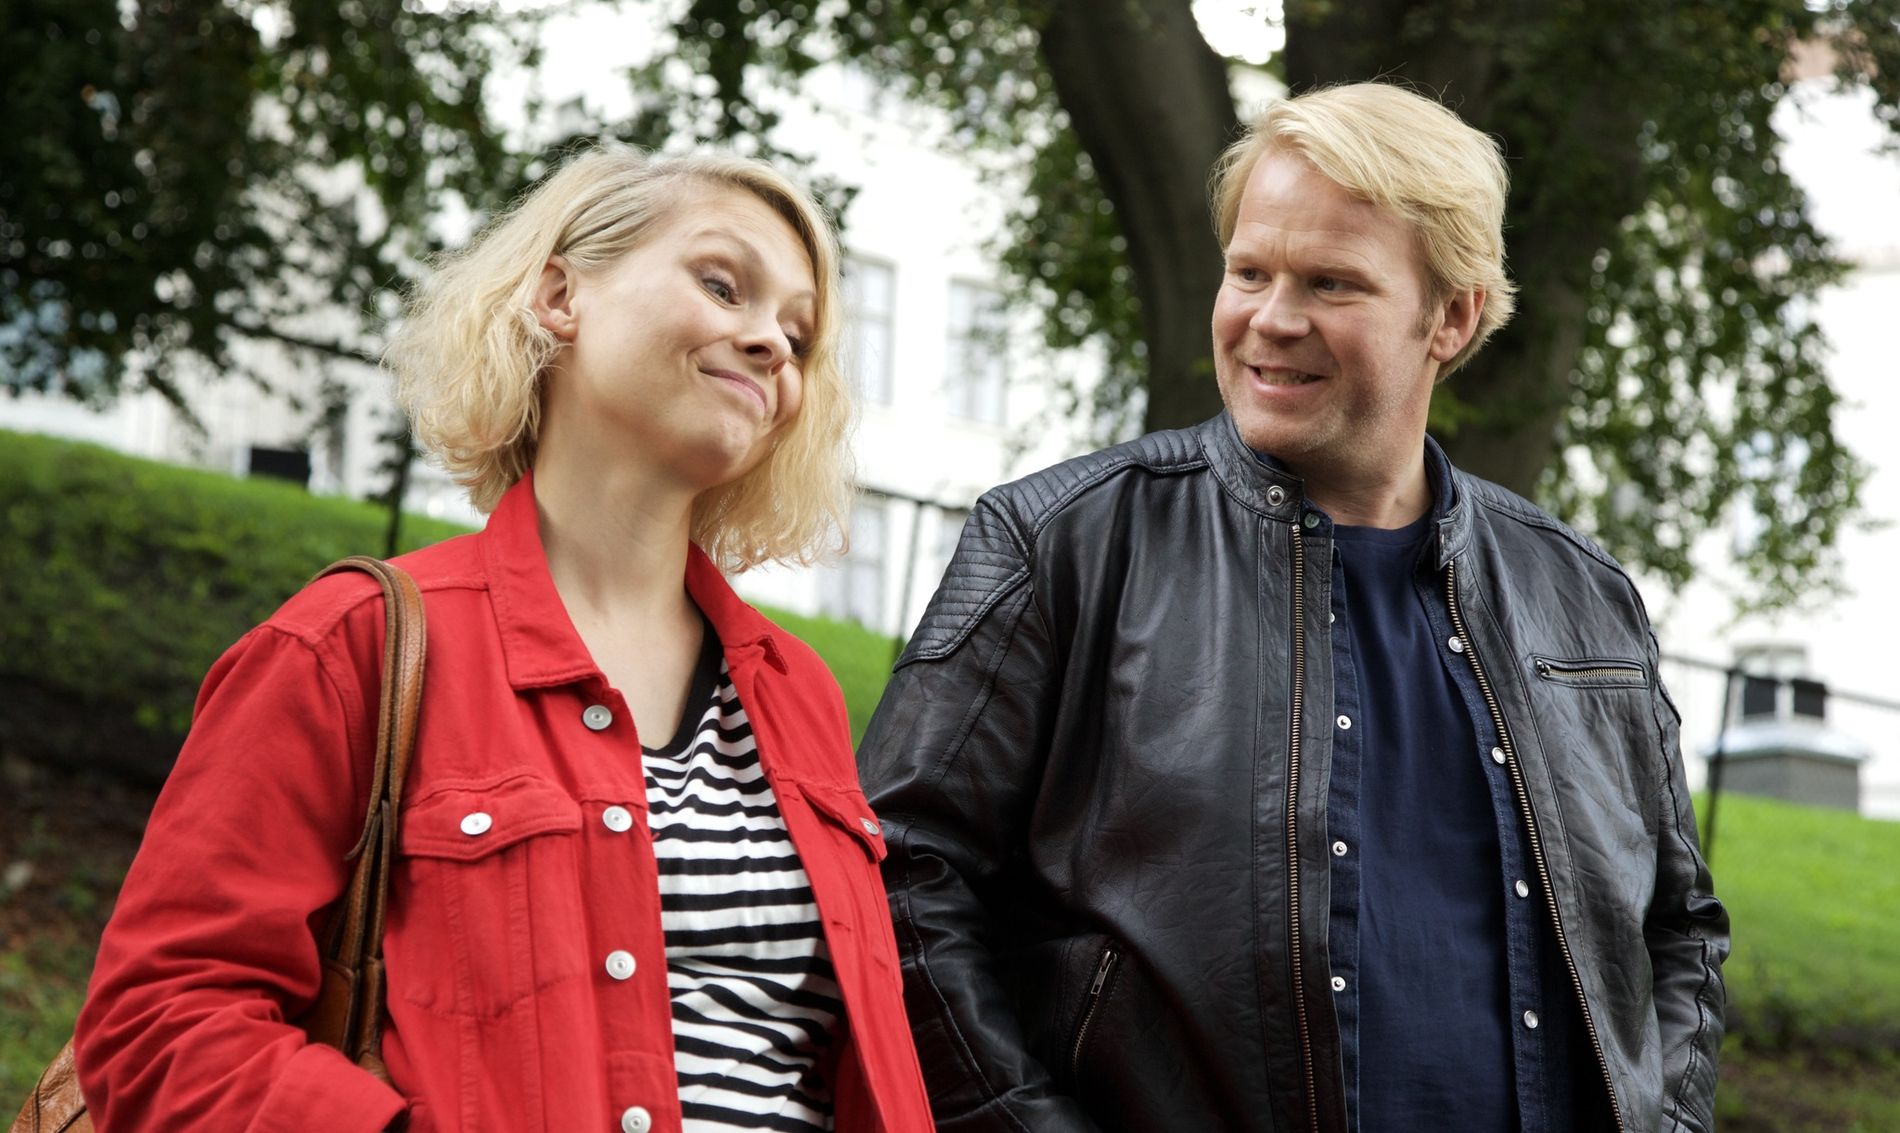 «EN NATT»: MyAnna Buring og Anders Baasmo Christiansen skal fylle 10 episoder, hver på en halv time.